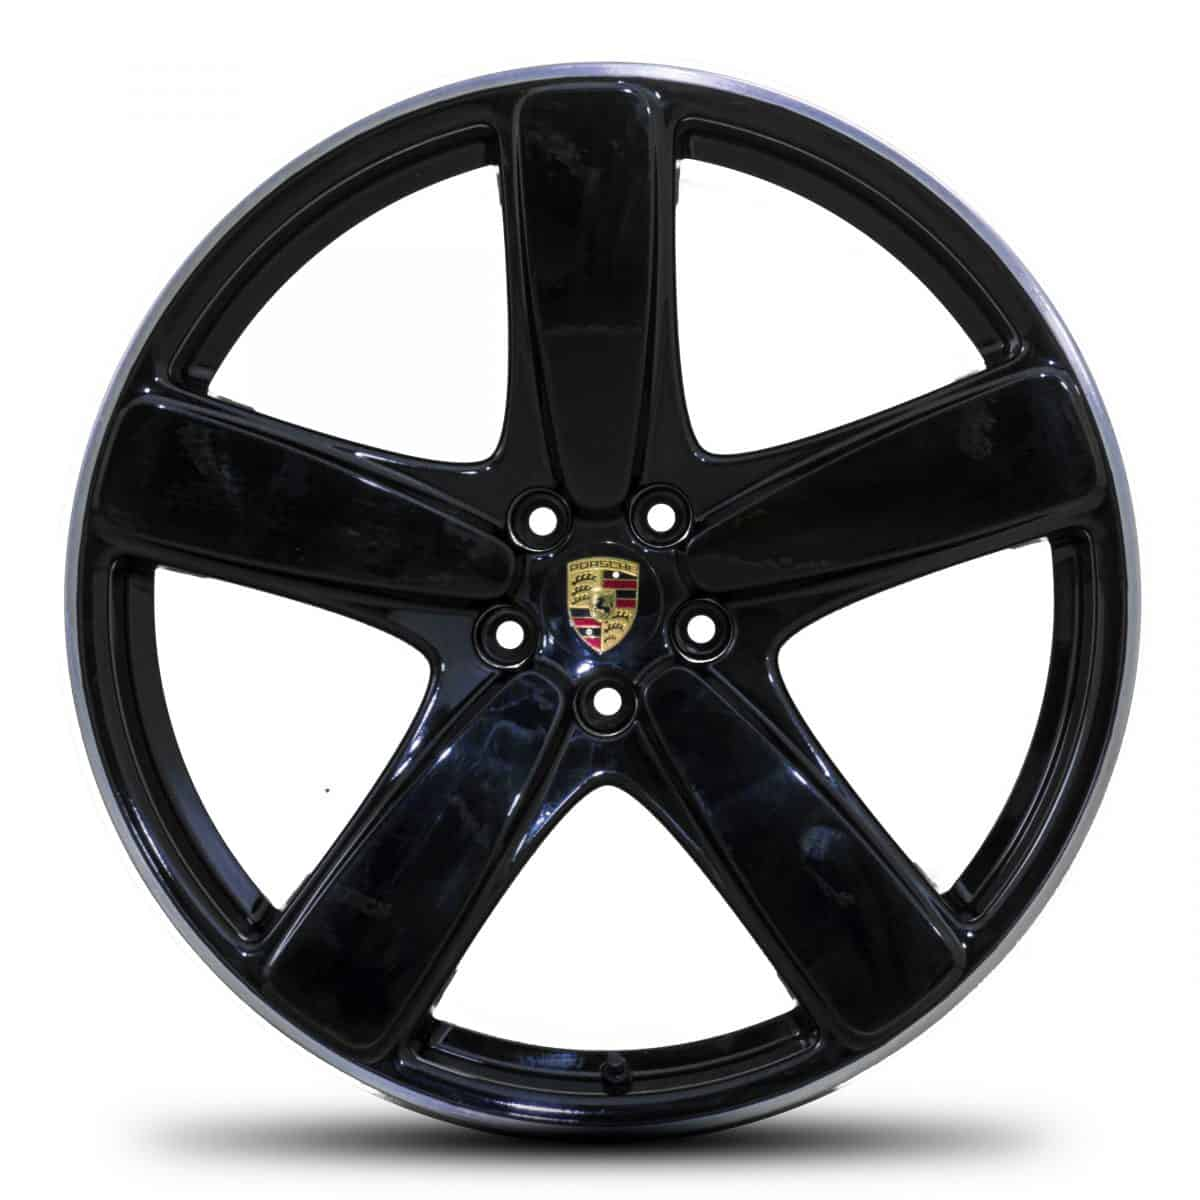 "Genuine Porsche Macan Turbo 95B Sport Classic 2 Spoke 21"" inch Alloy Wheels with Satin Black & Diamond Turned Finish 95B601025AC041 95B601025AE041"